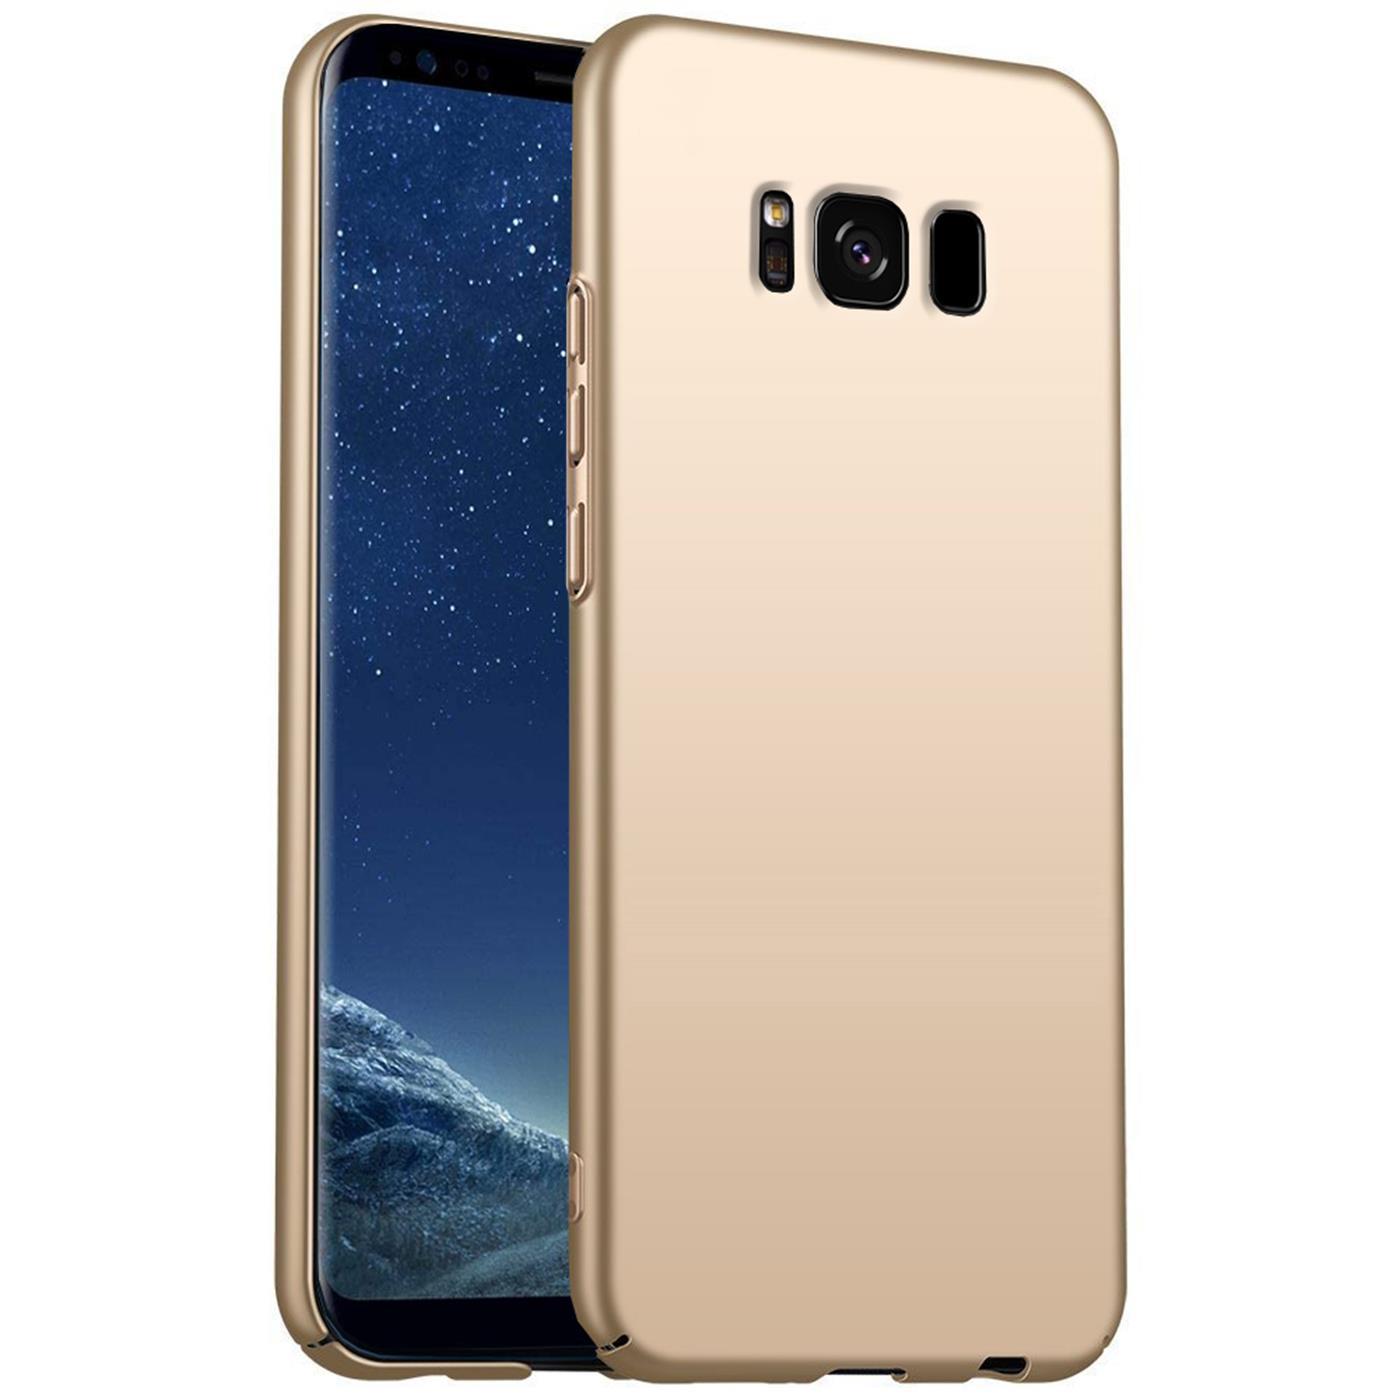 Hard-Back-Case-Cover-Samsung-Galaxy-s4-duenn-Cover-Slim-Shockproof-Rugged Indexbild 14